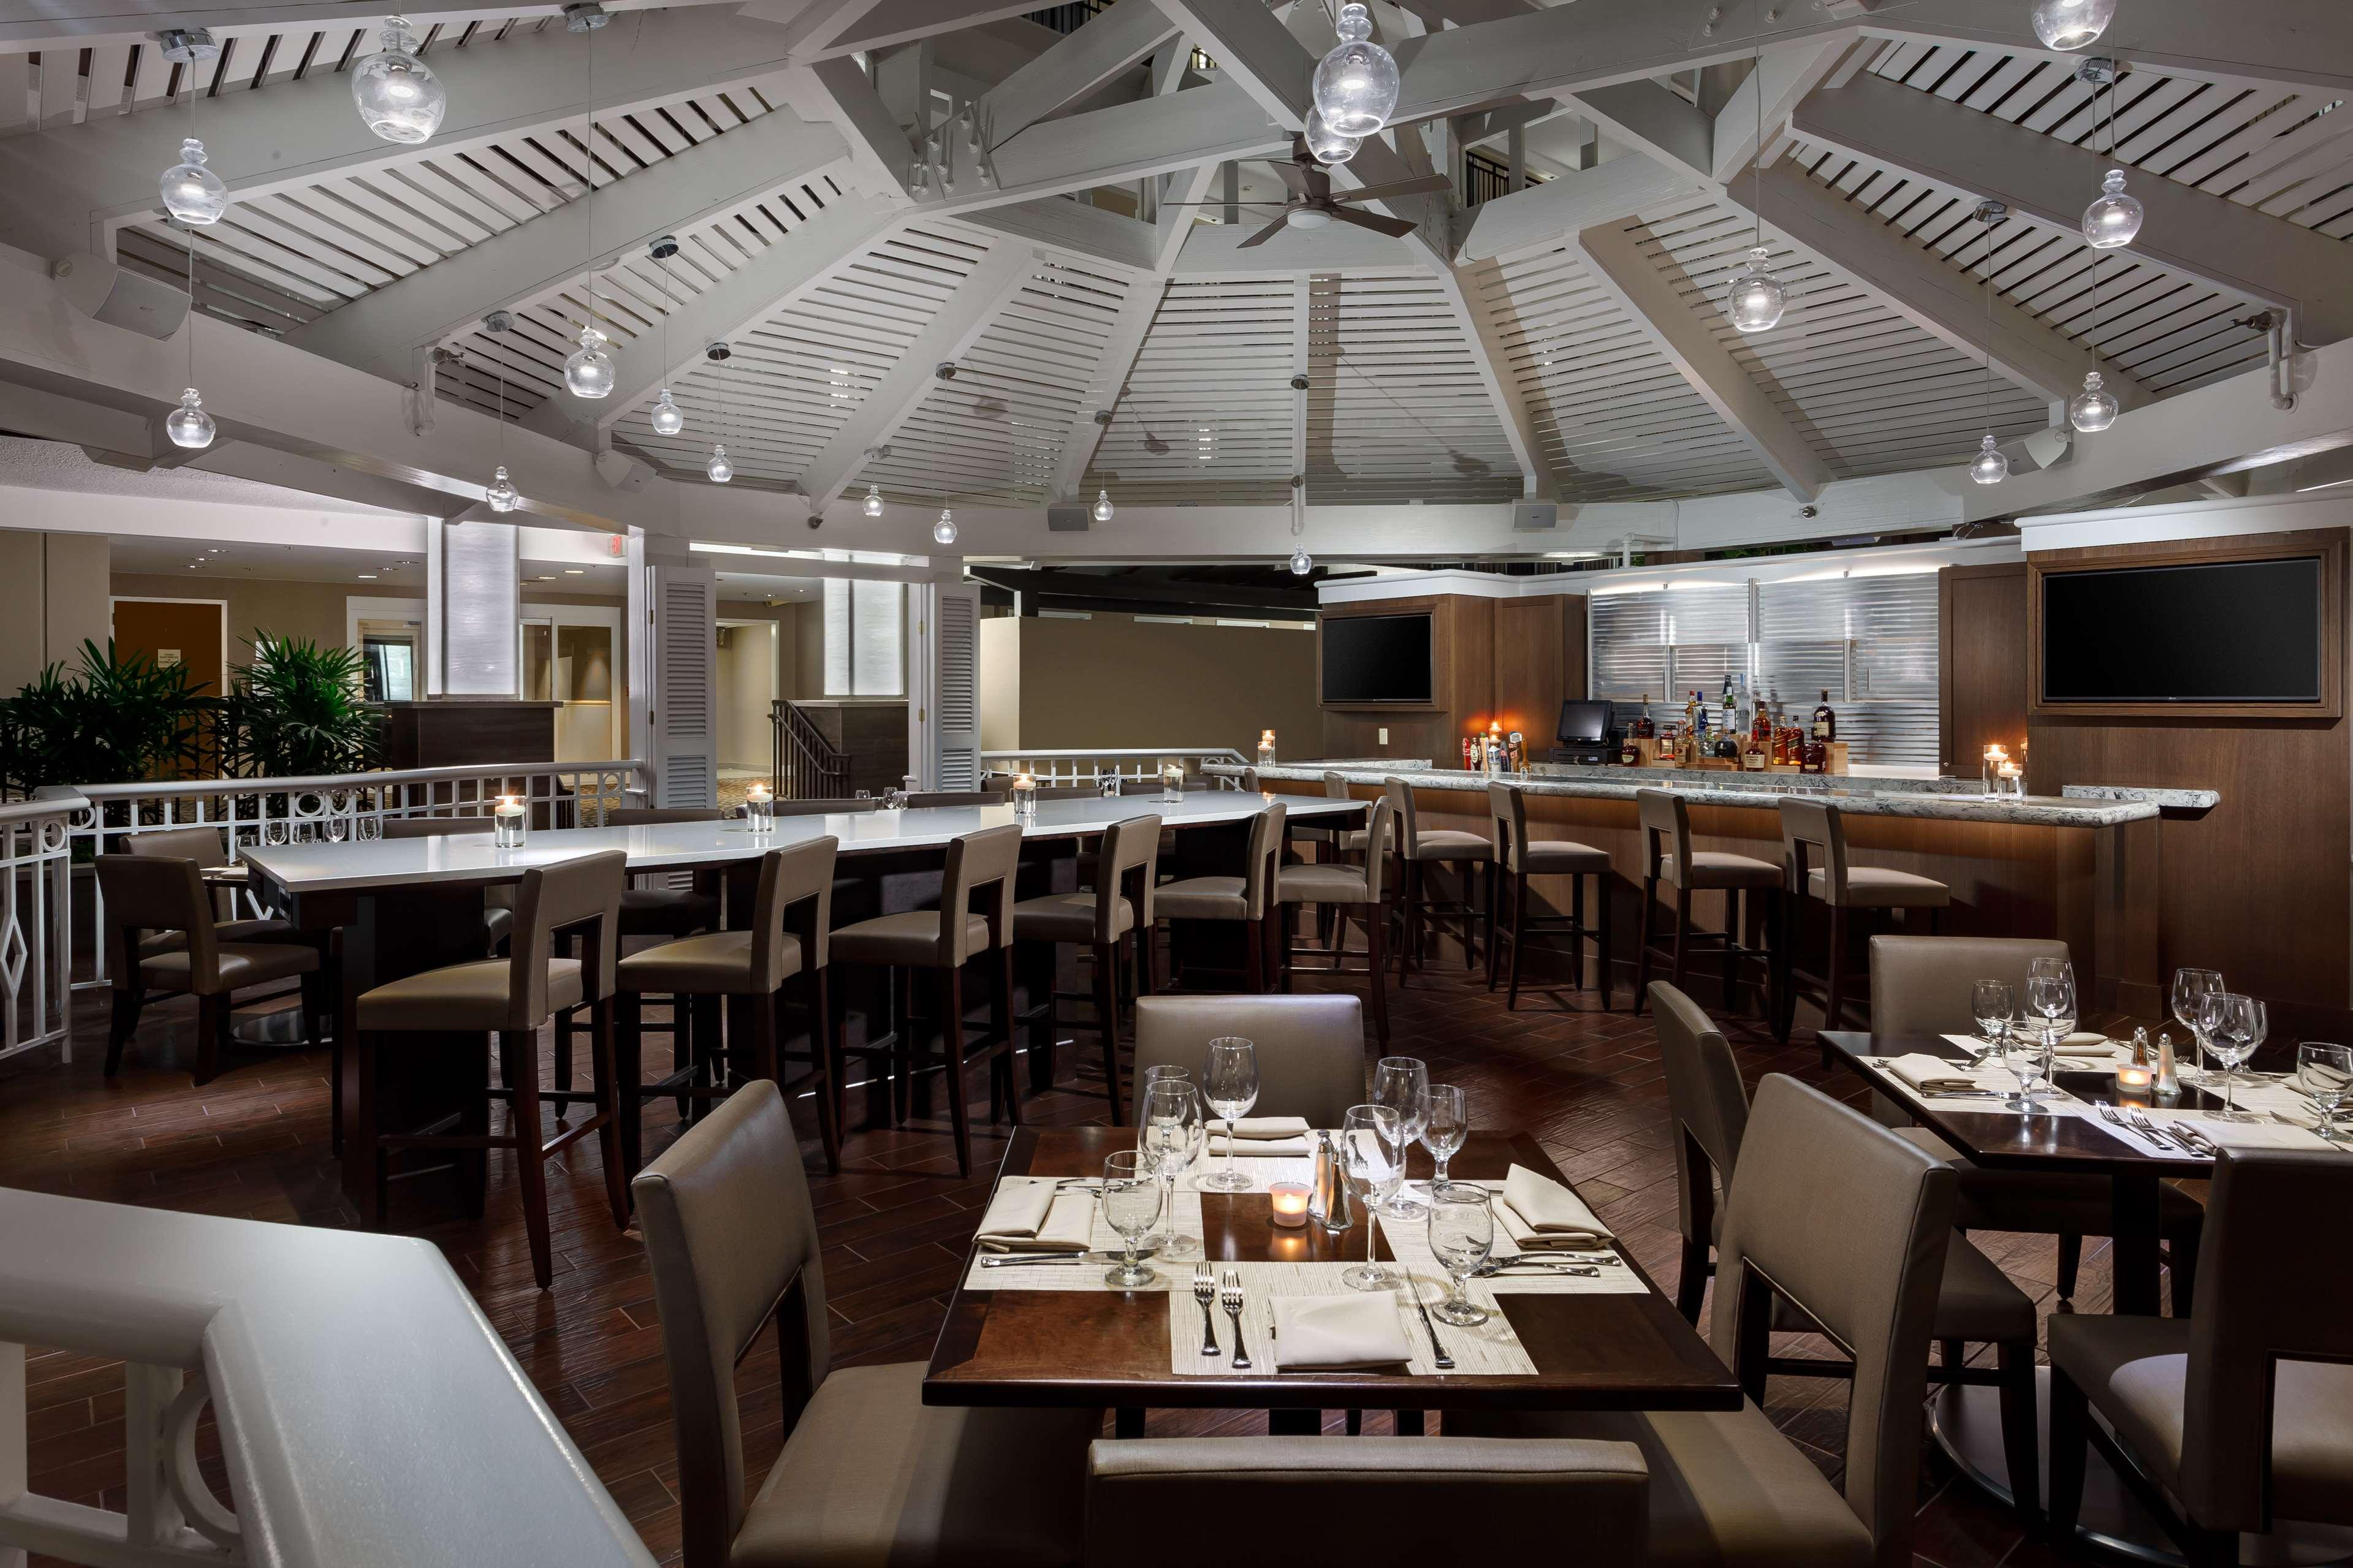 Embassy Suites by Hilton Orlando Lake Buena Vista Resort image 12